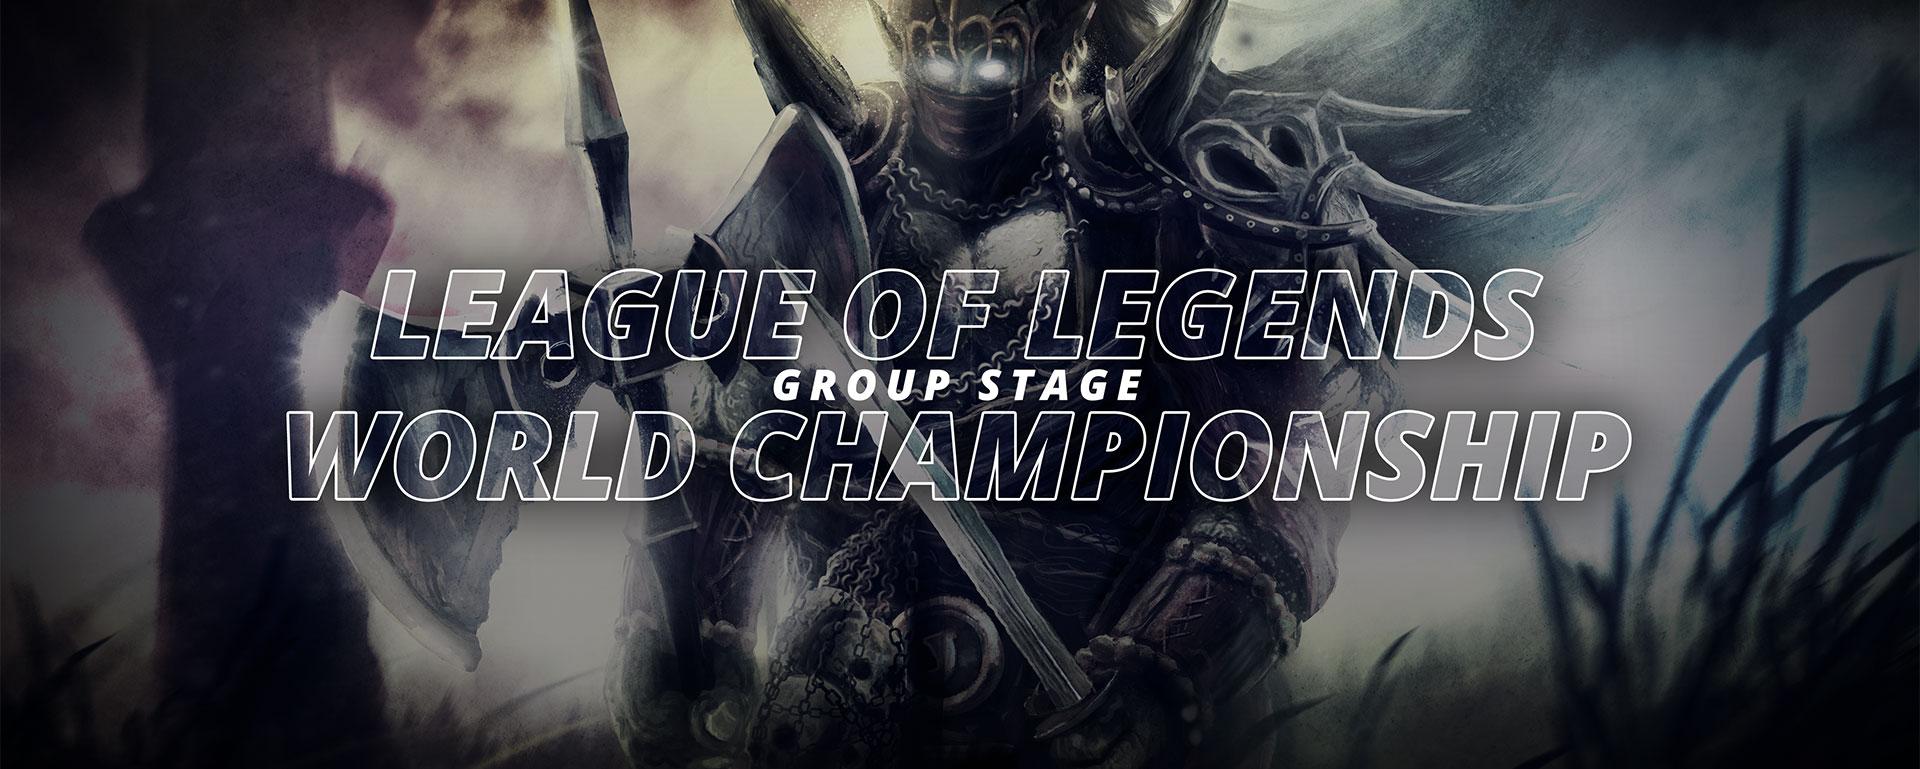 LEAGUE OF LEGENDS — 2021 WORLD CHAMPIONSHIP